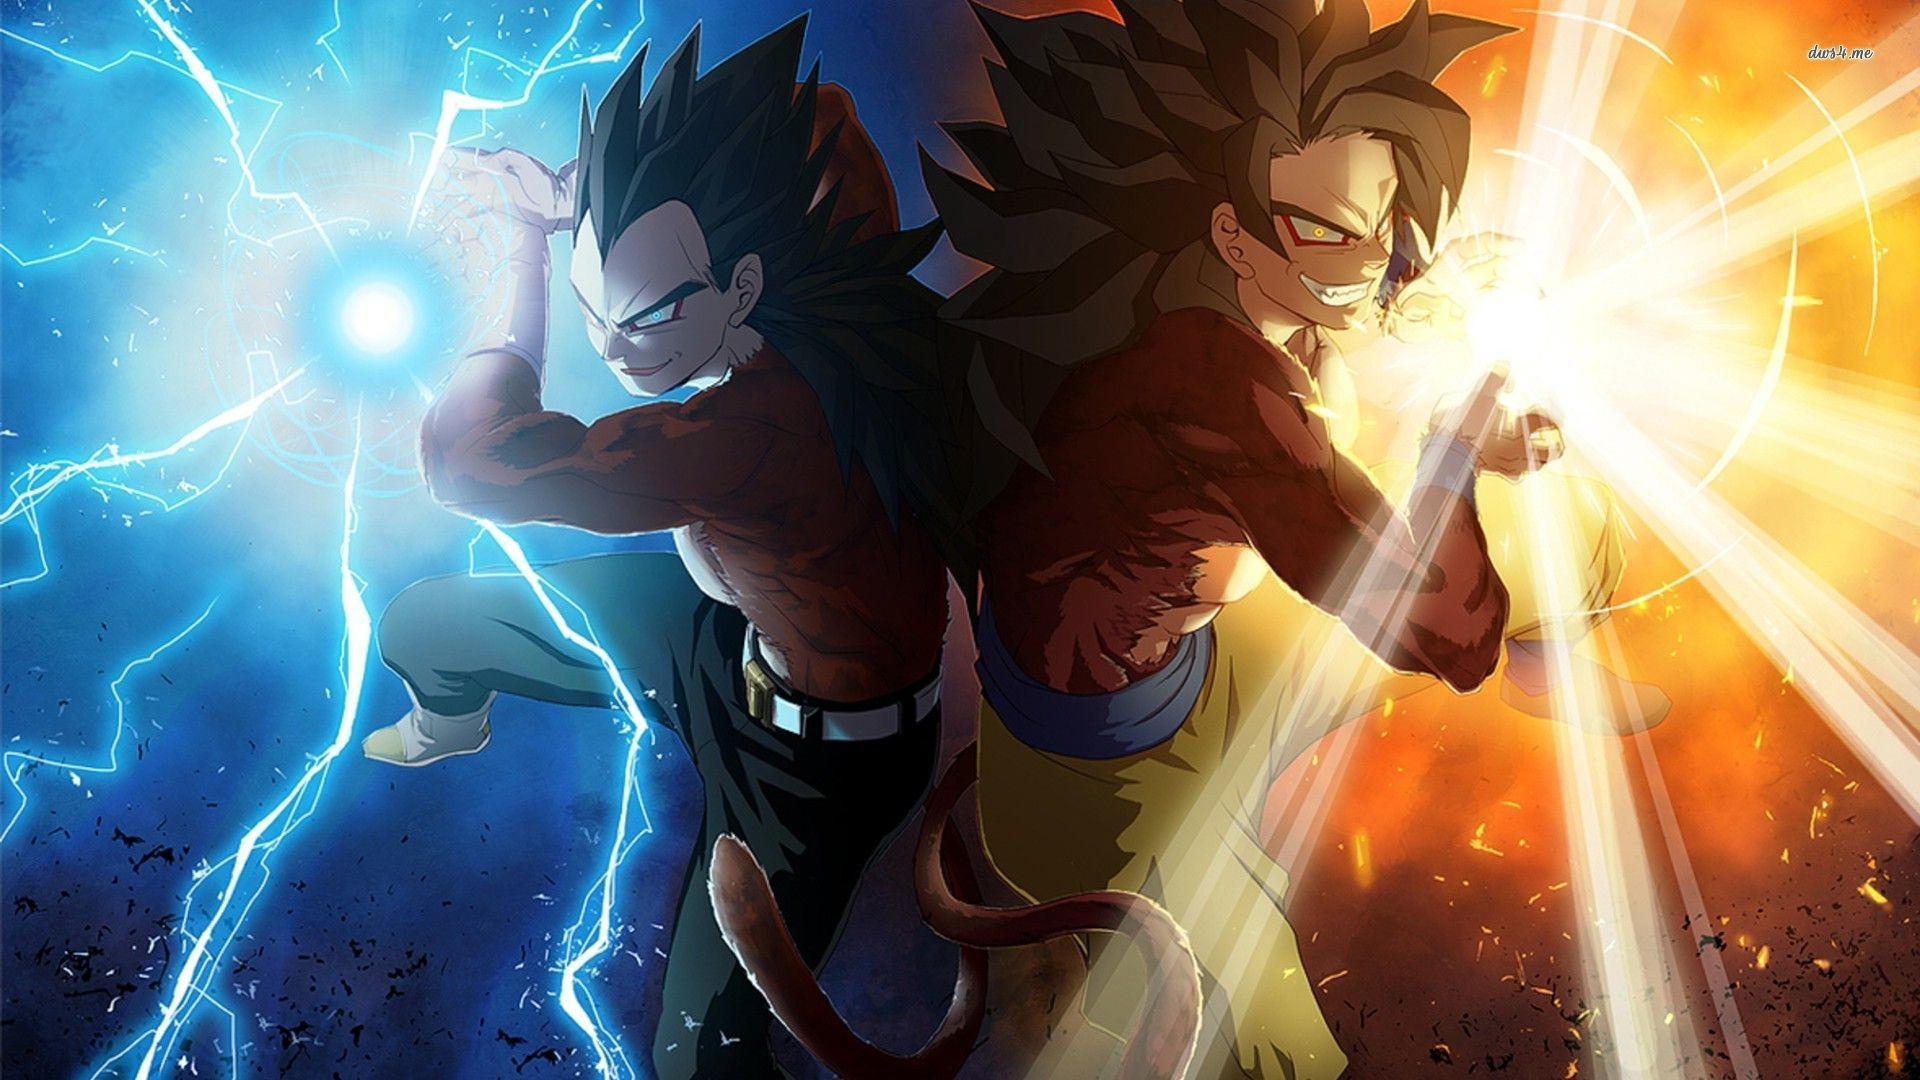 Dragon Ball Z Kid Goku Wallpaper נאוה זרניצקי אדריכלית שהואשמה